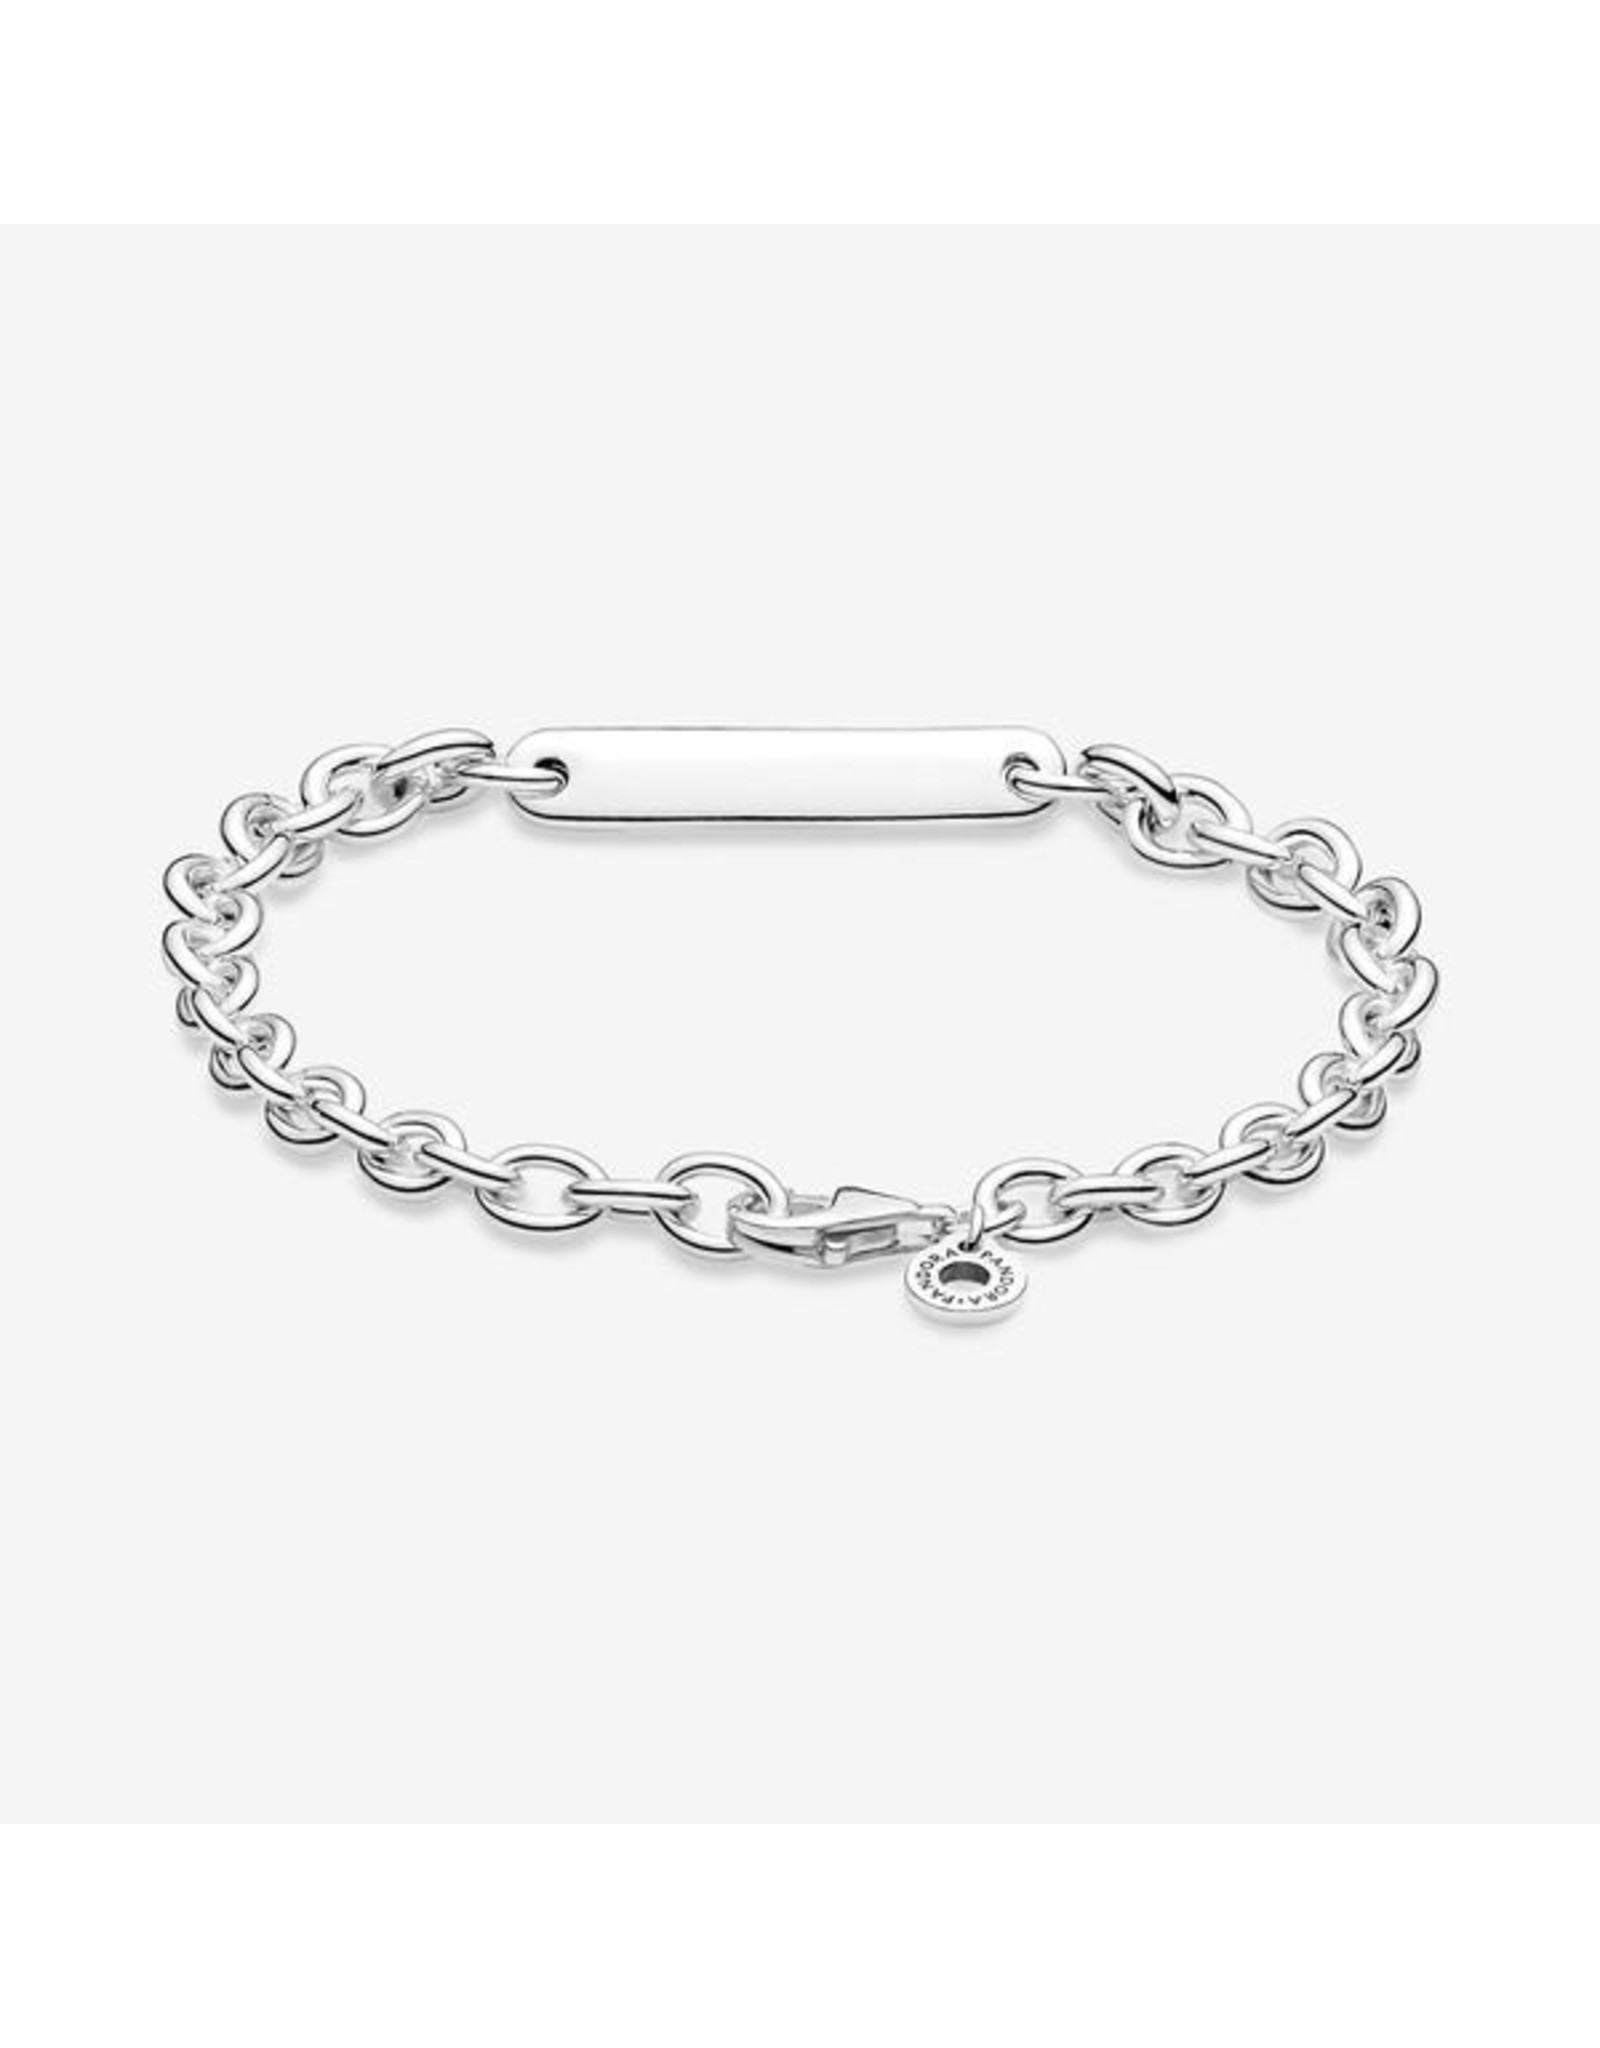 Pandora Pandora Bracelet, 599523C00, Engravable Bar Link